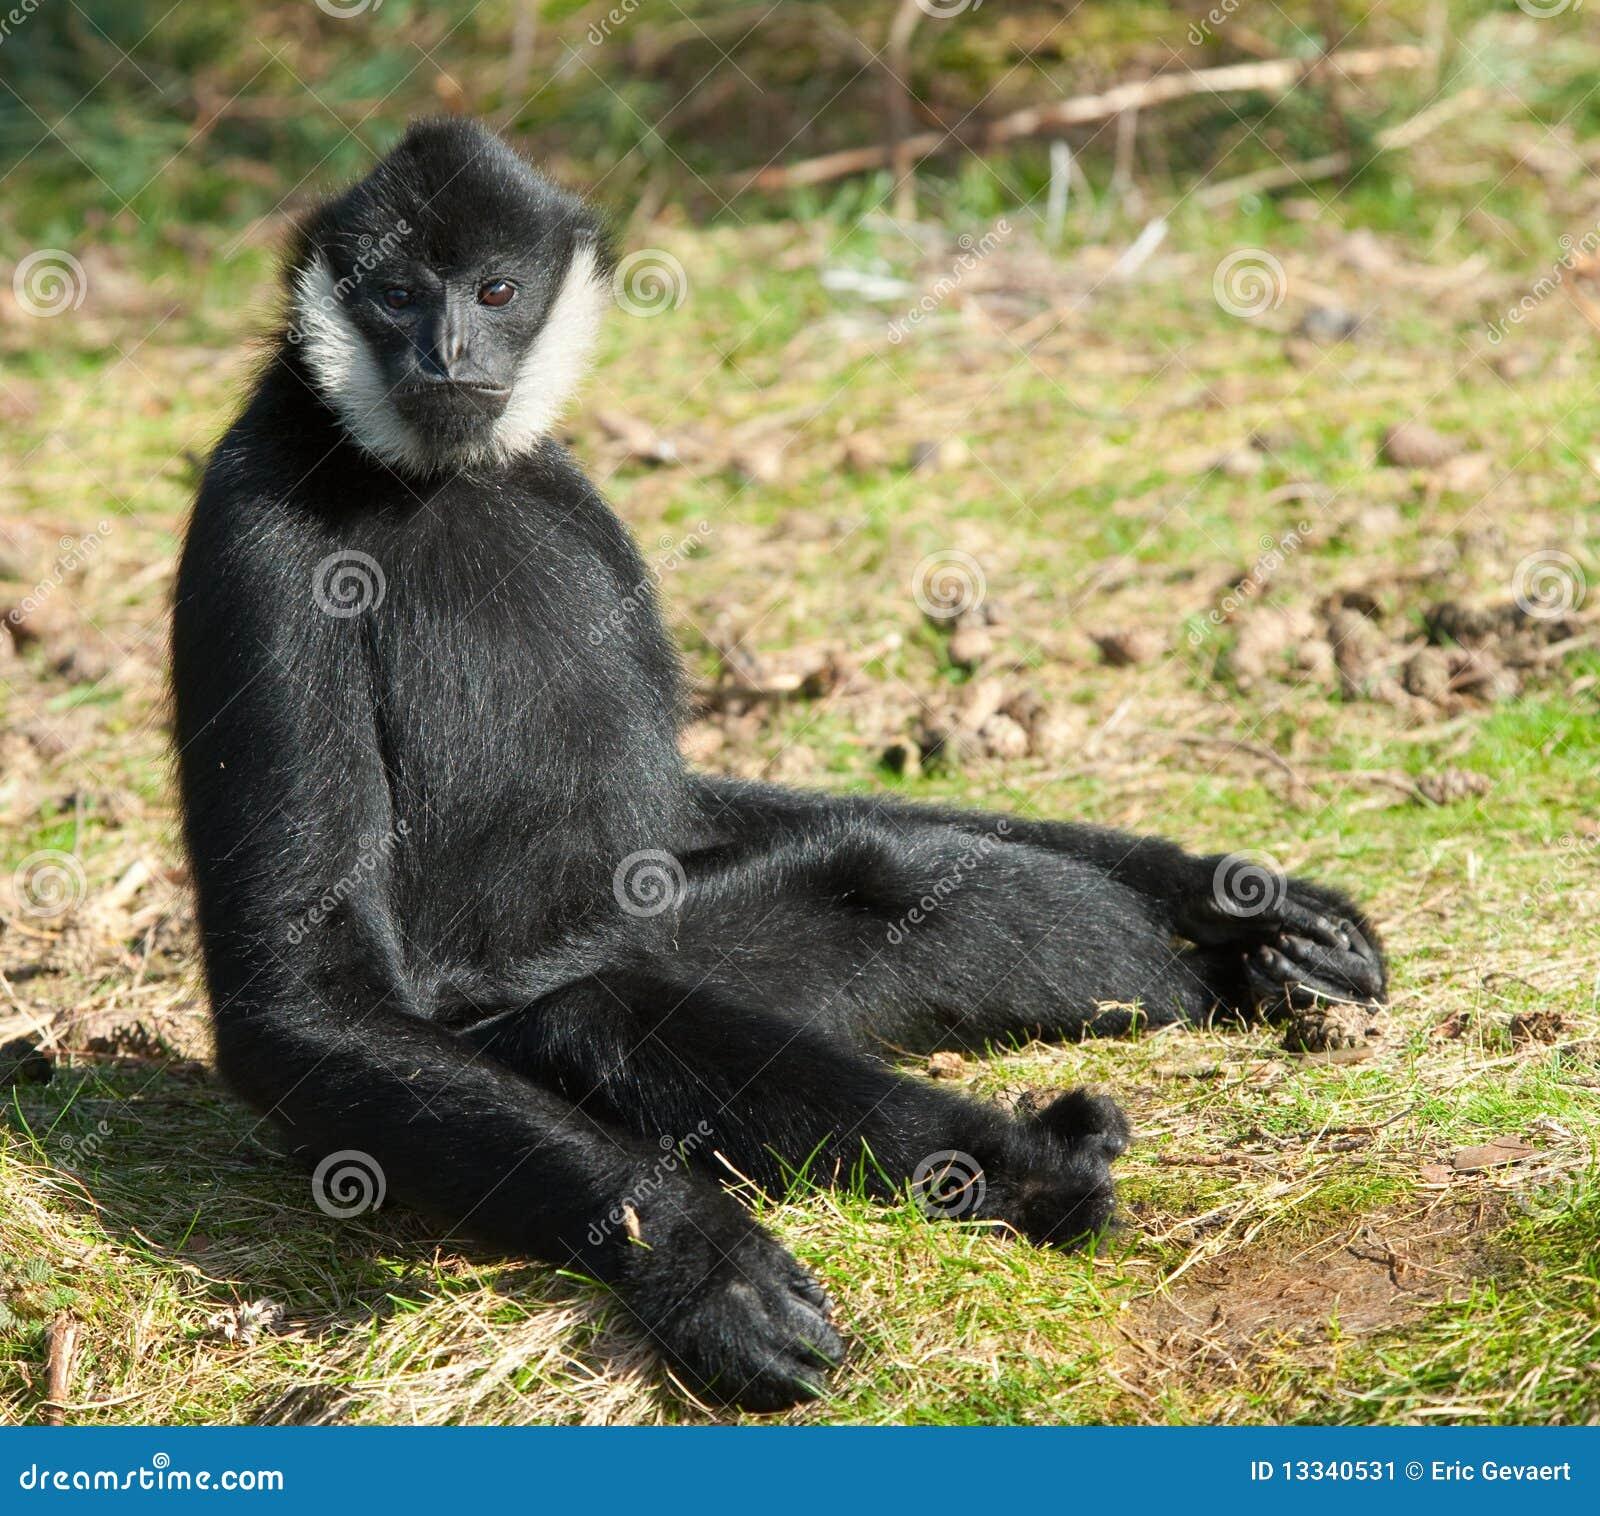 Male White-cheeked gibbon